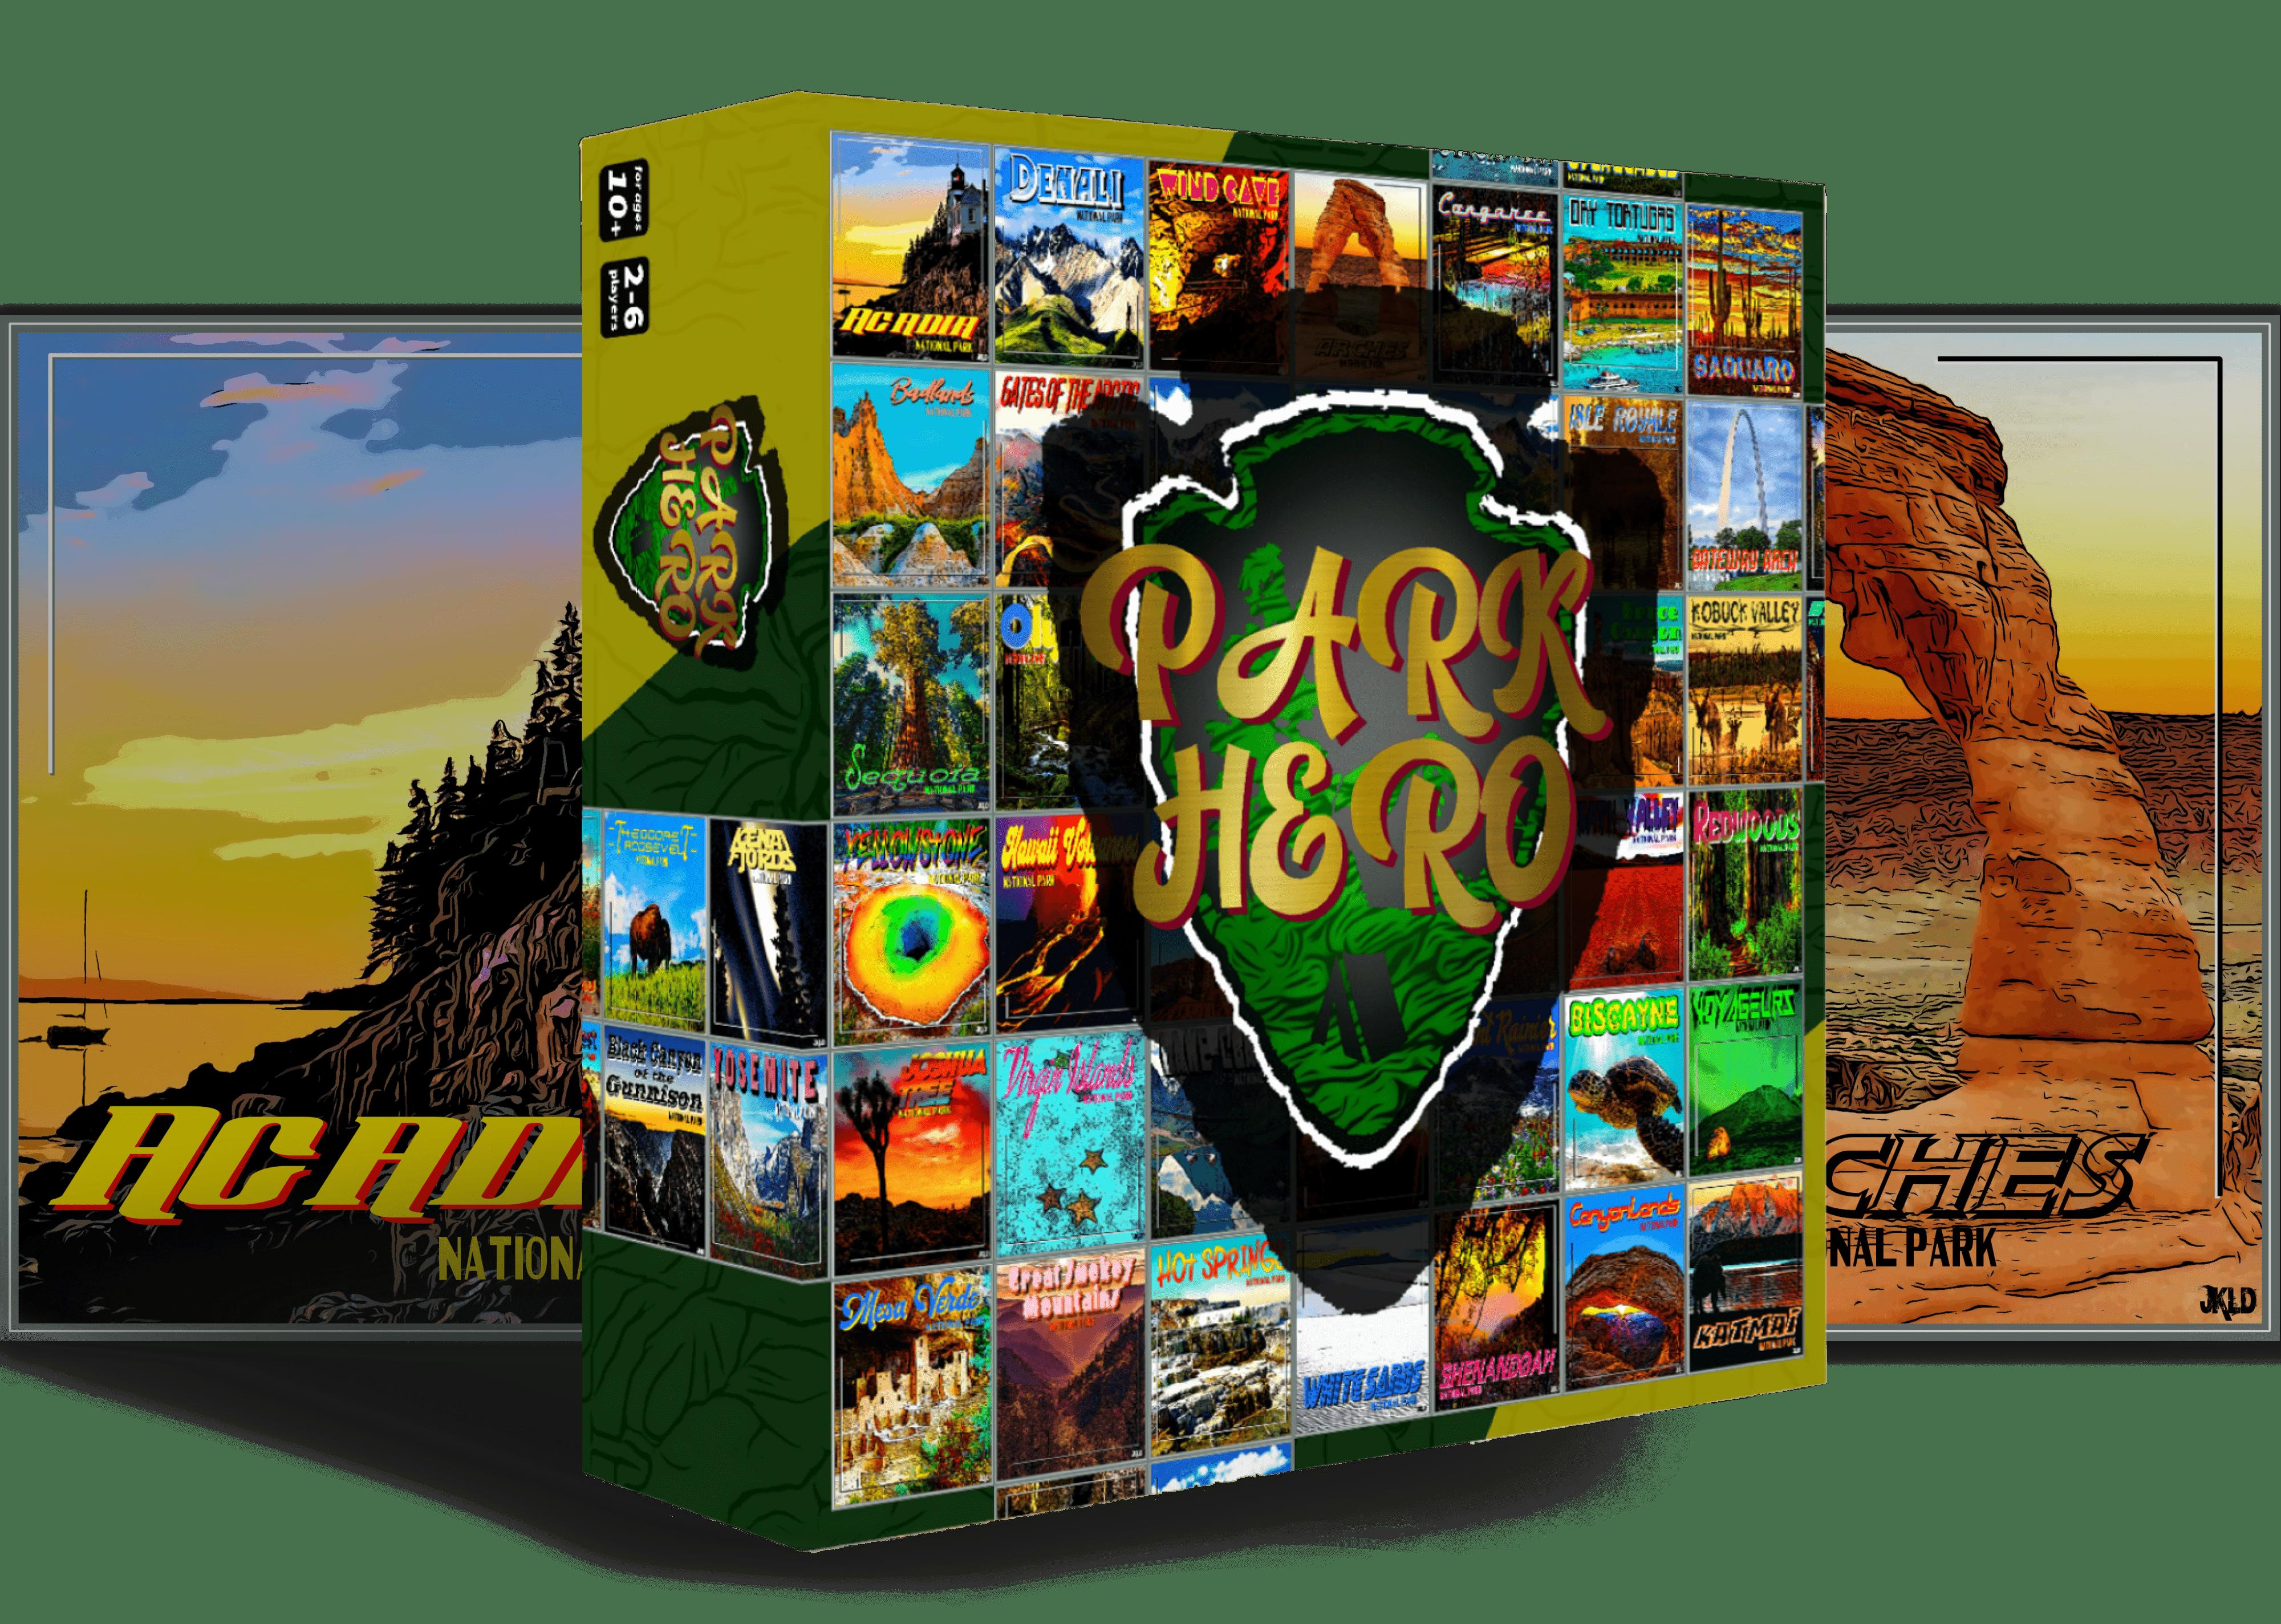 Park Hero board game